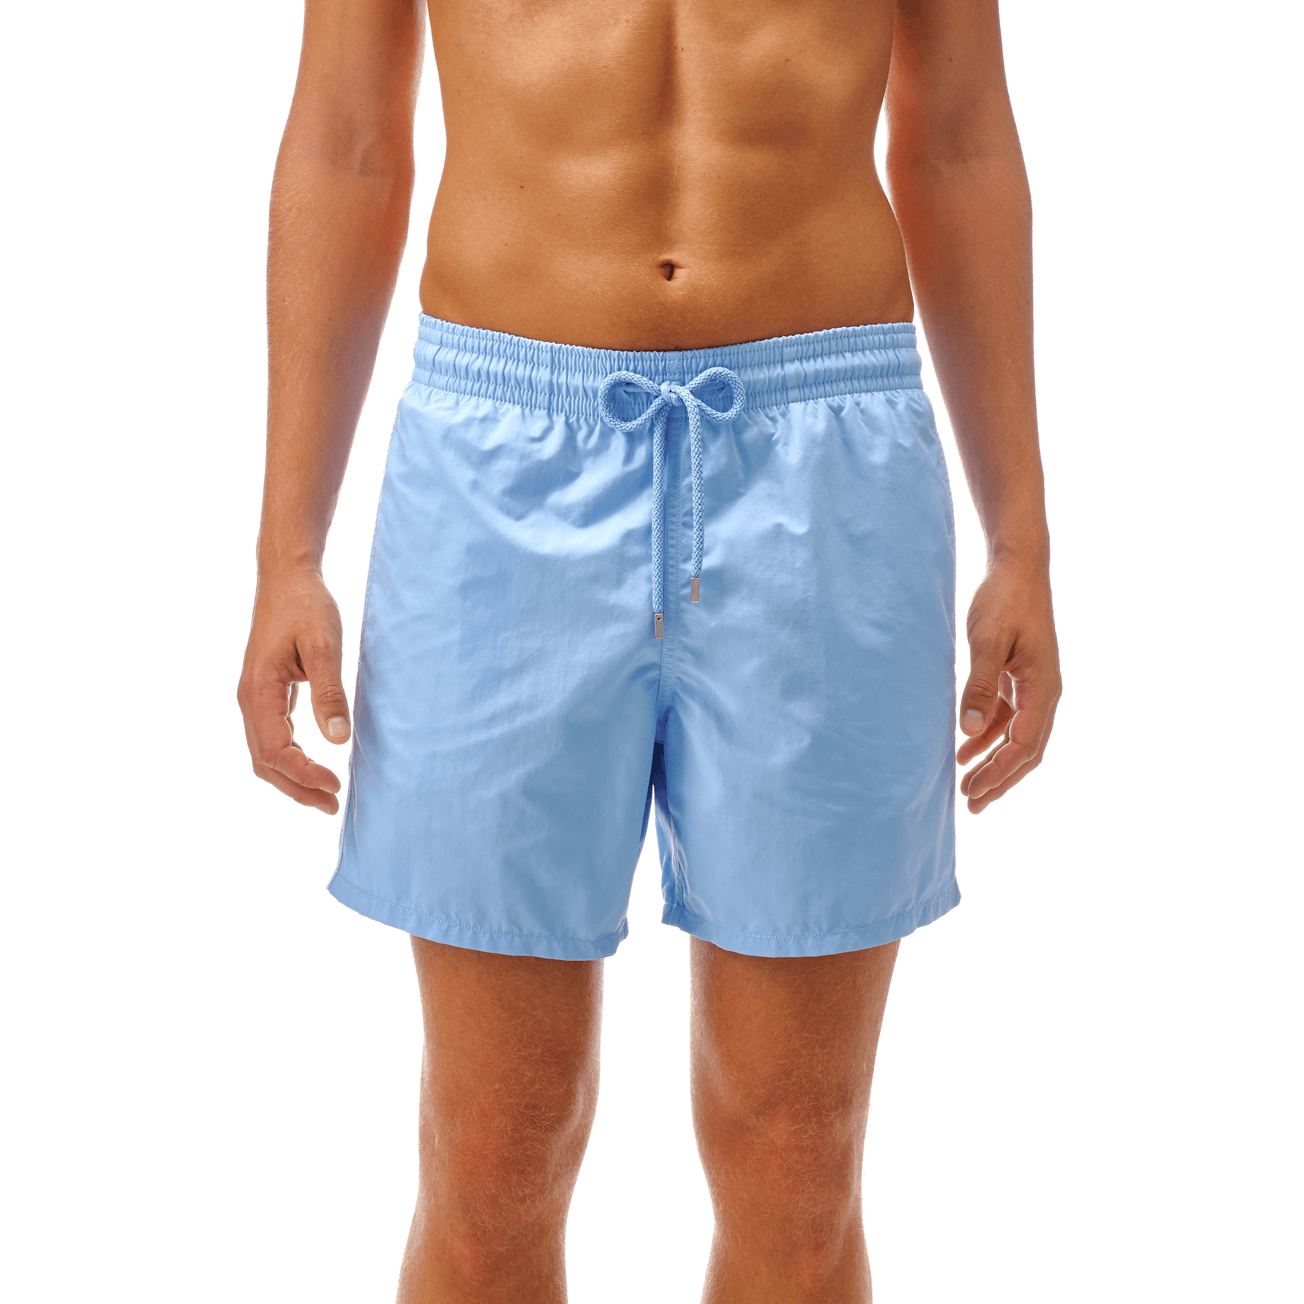 Vilebrequin Mens Moorea Solid Swim Trunk Swim Trunks